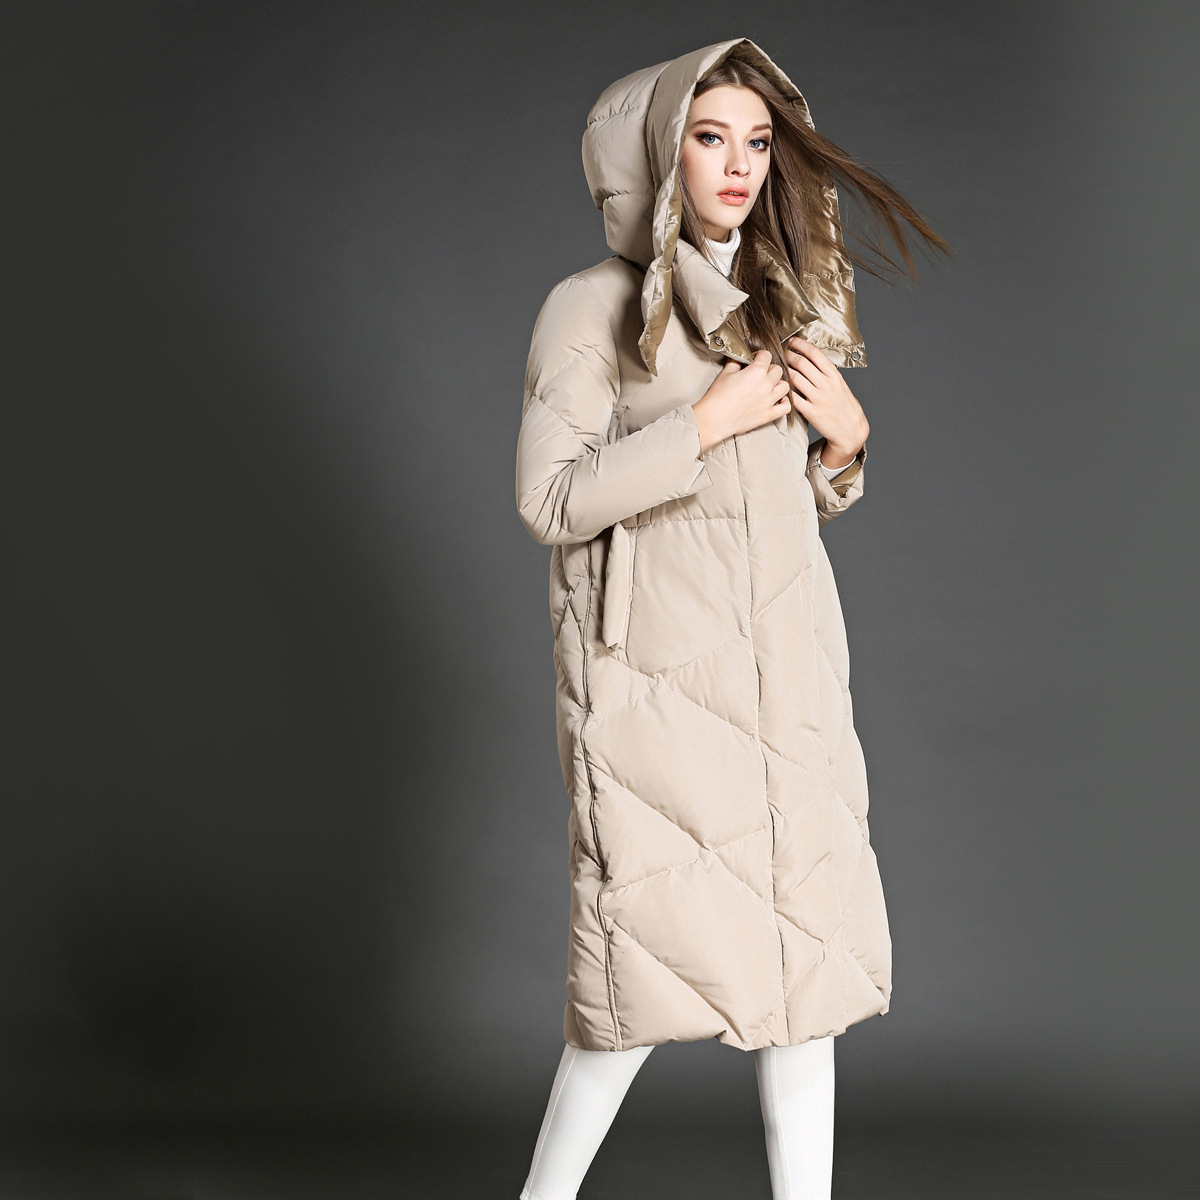 Womens Winter Jackets And Coats Winter Jacket Women Coat Manteau Femme Goose Long Coats Casaco Feminino Abrigos Hot Sale #007 manteau femme winter jacket women long coat casacos de inverno feminino womens winter jackets and coats abrigos de mujer 098